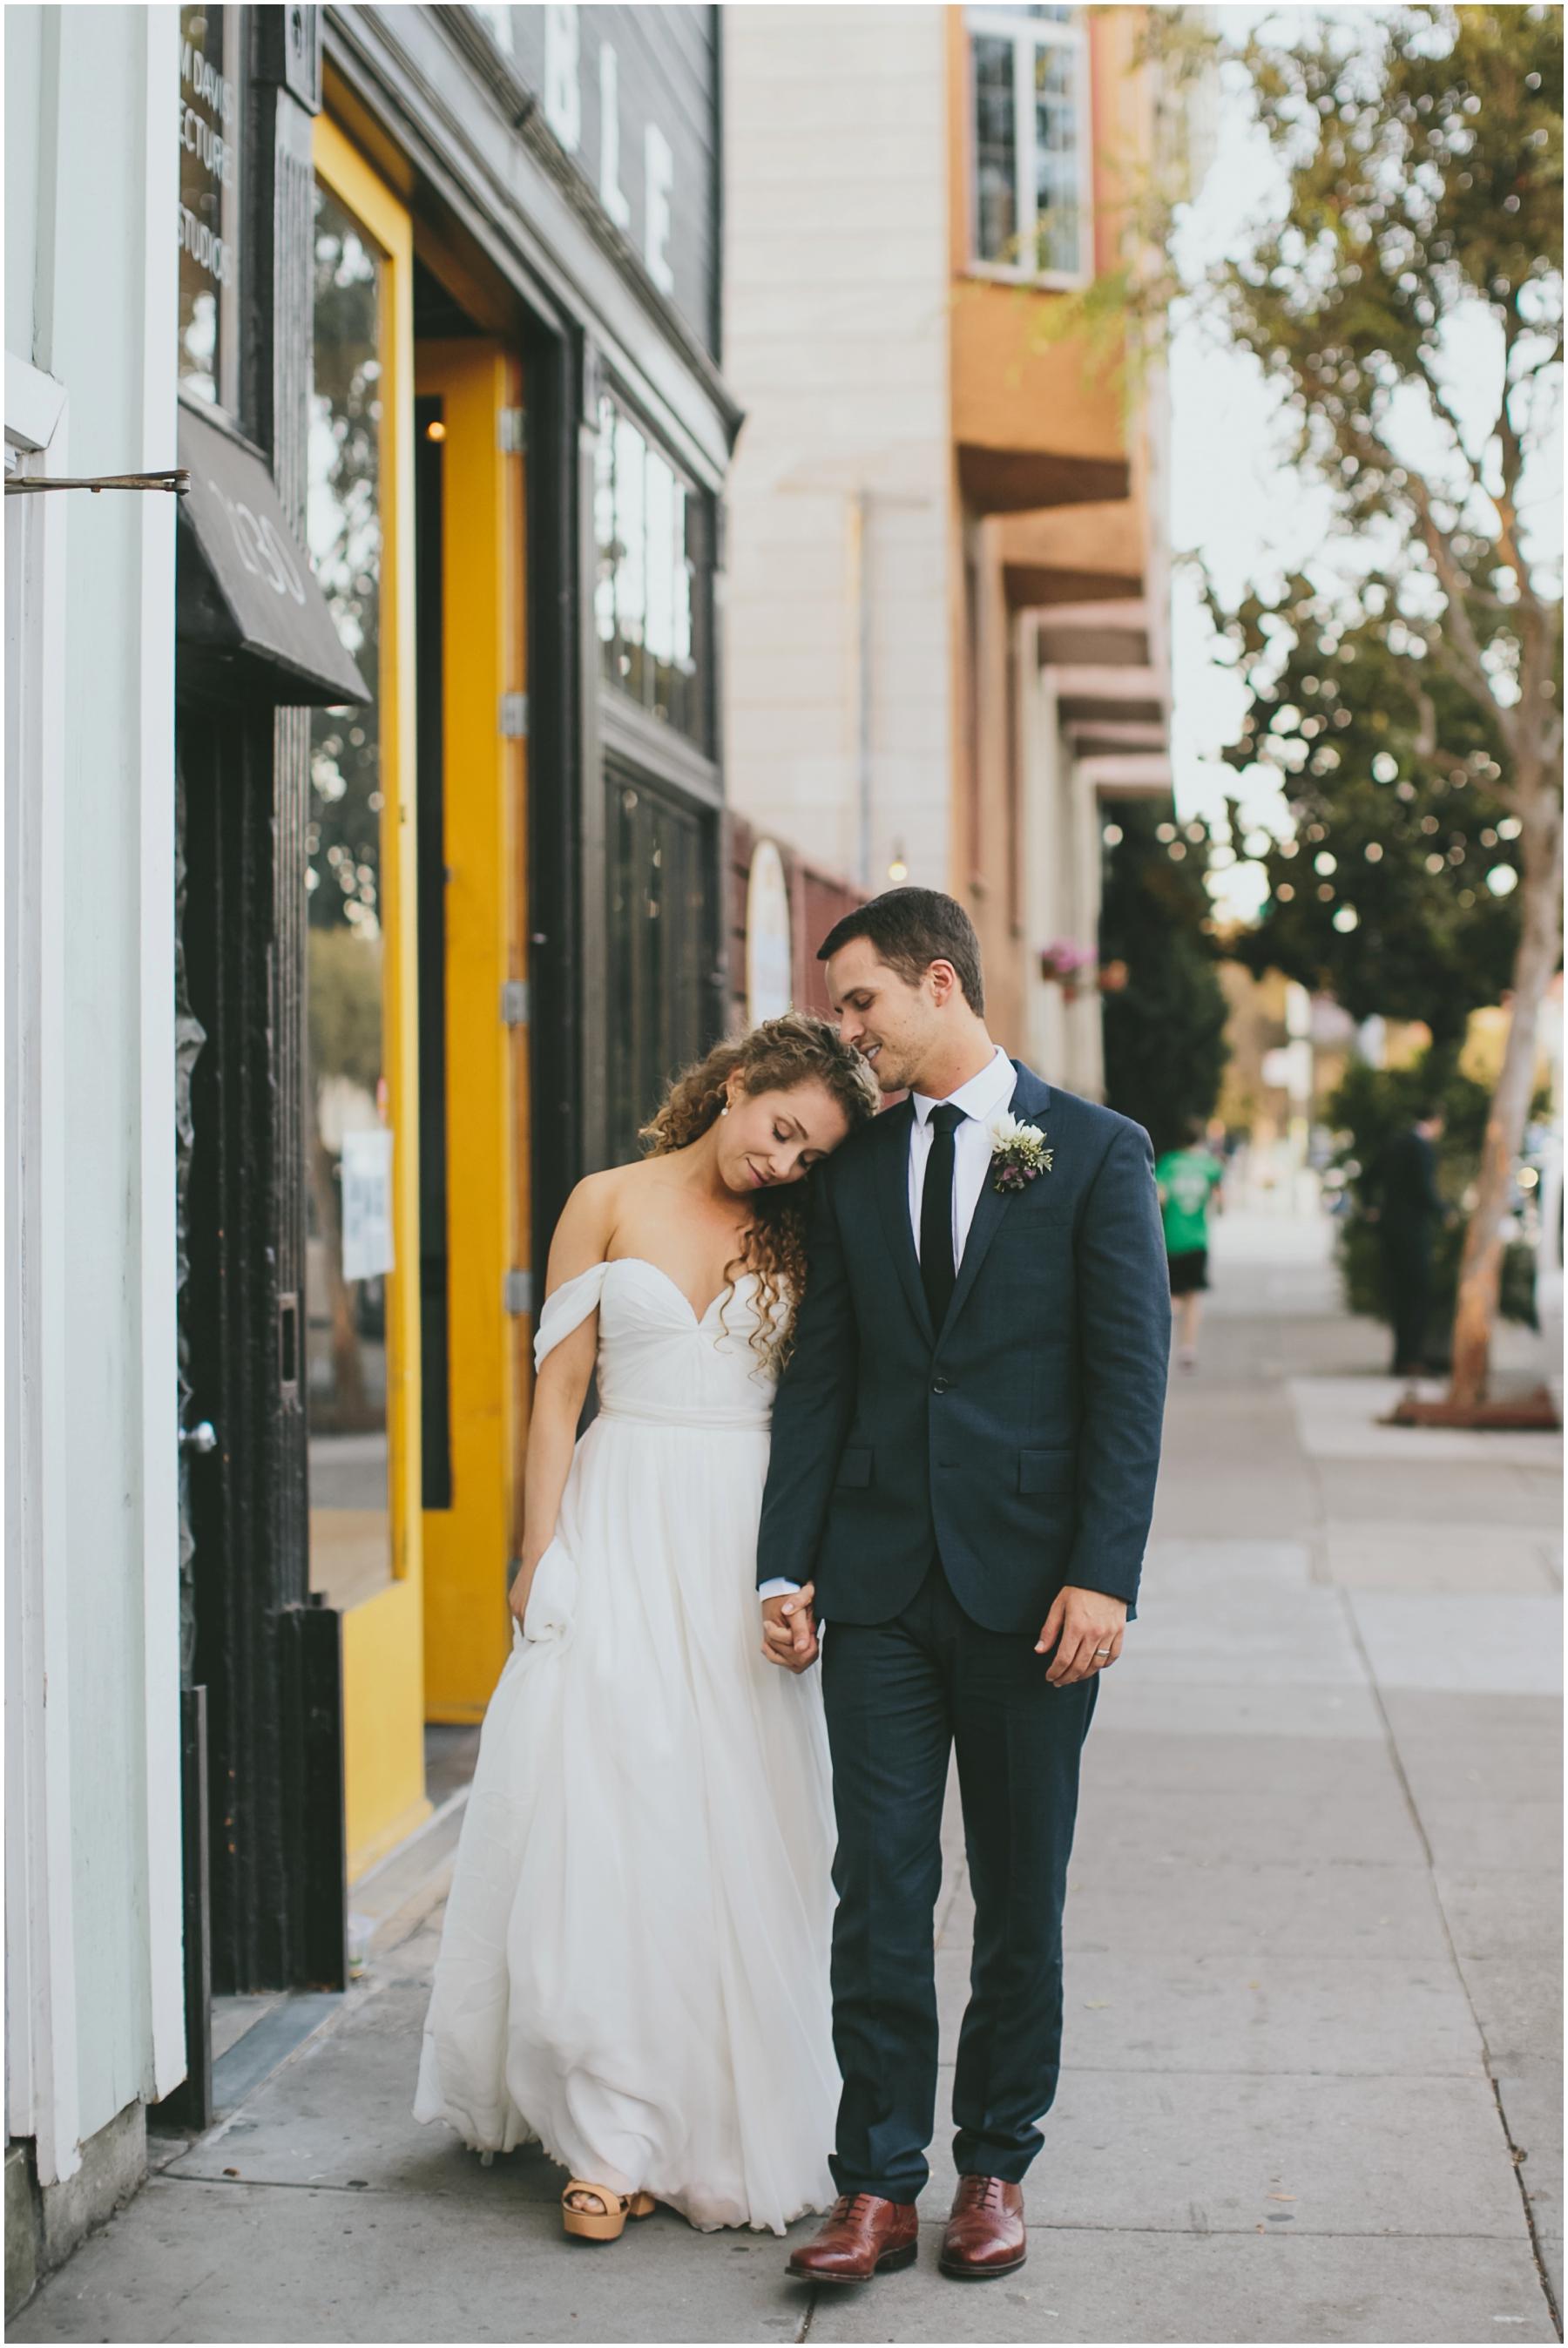 Emily+Paul-WEDDING_KellyBoitanoPhotography_0125